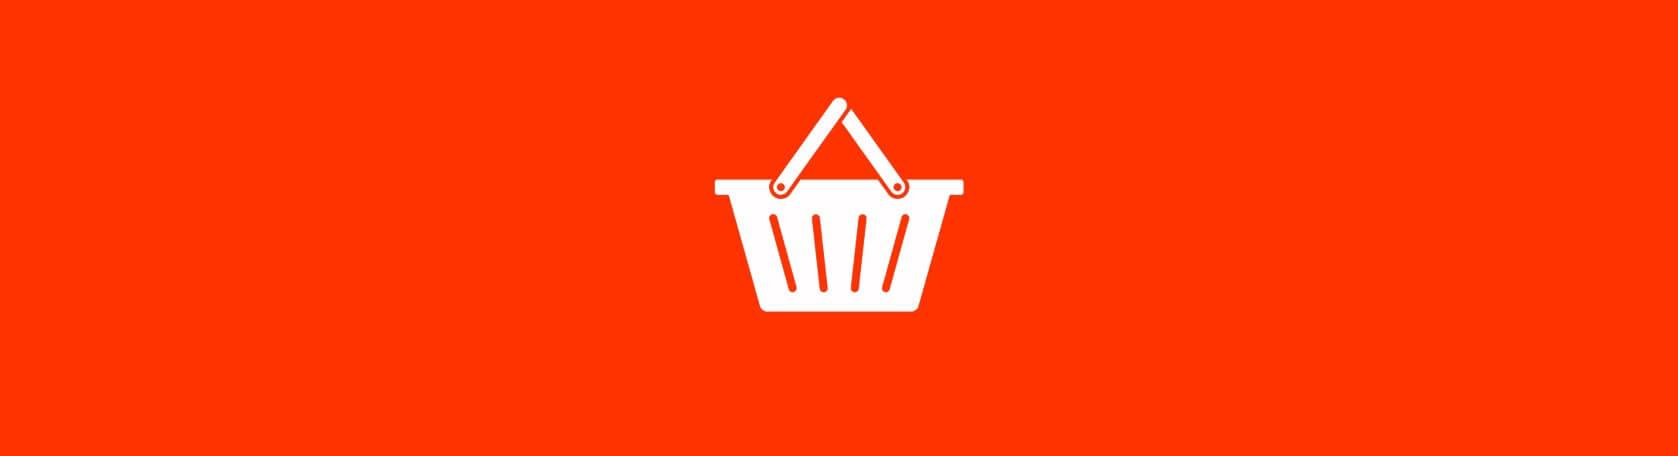 woocommerce xt commerce magento opencart jtl. Black Bedroom Furniture Sets. Home Design Ideas